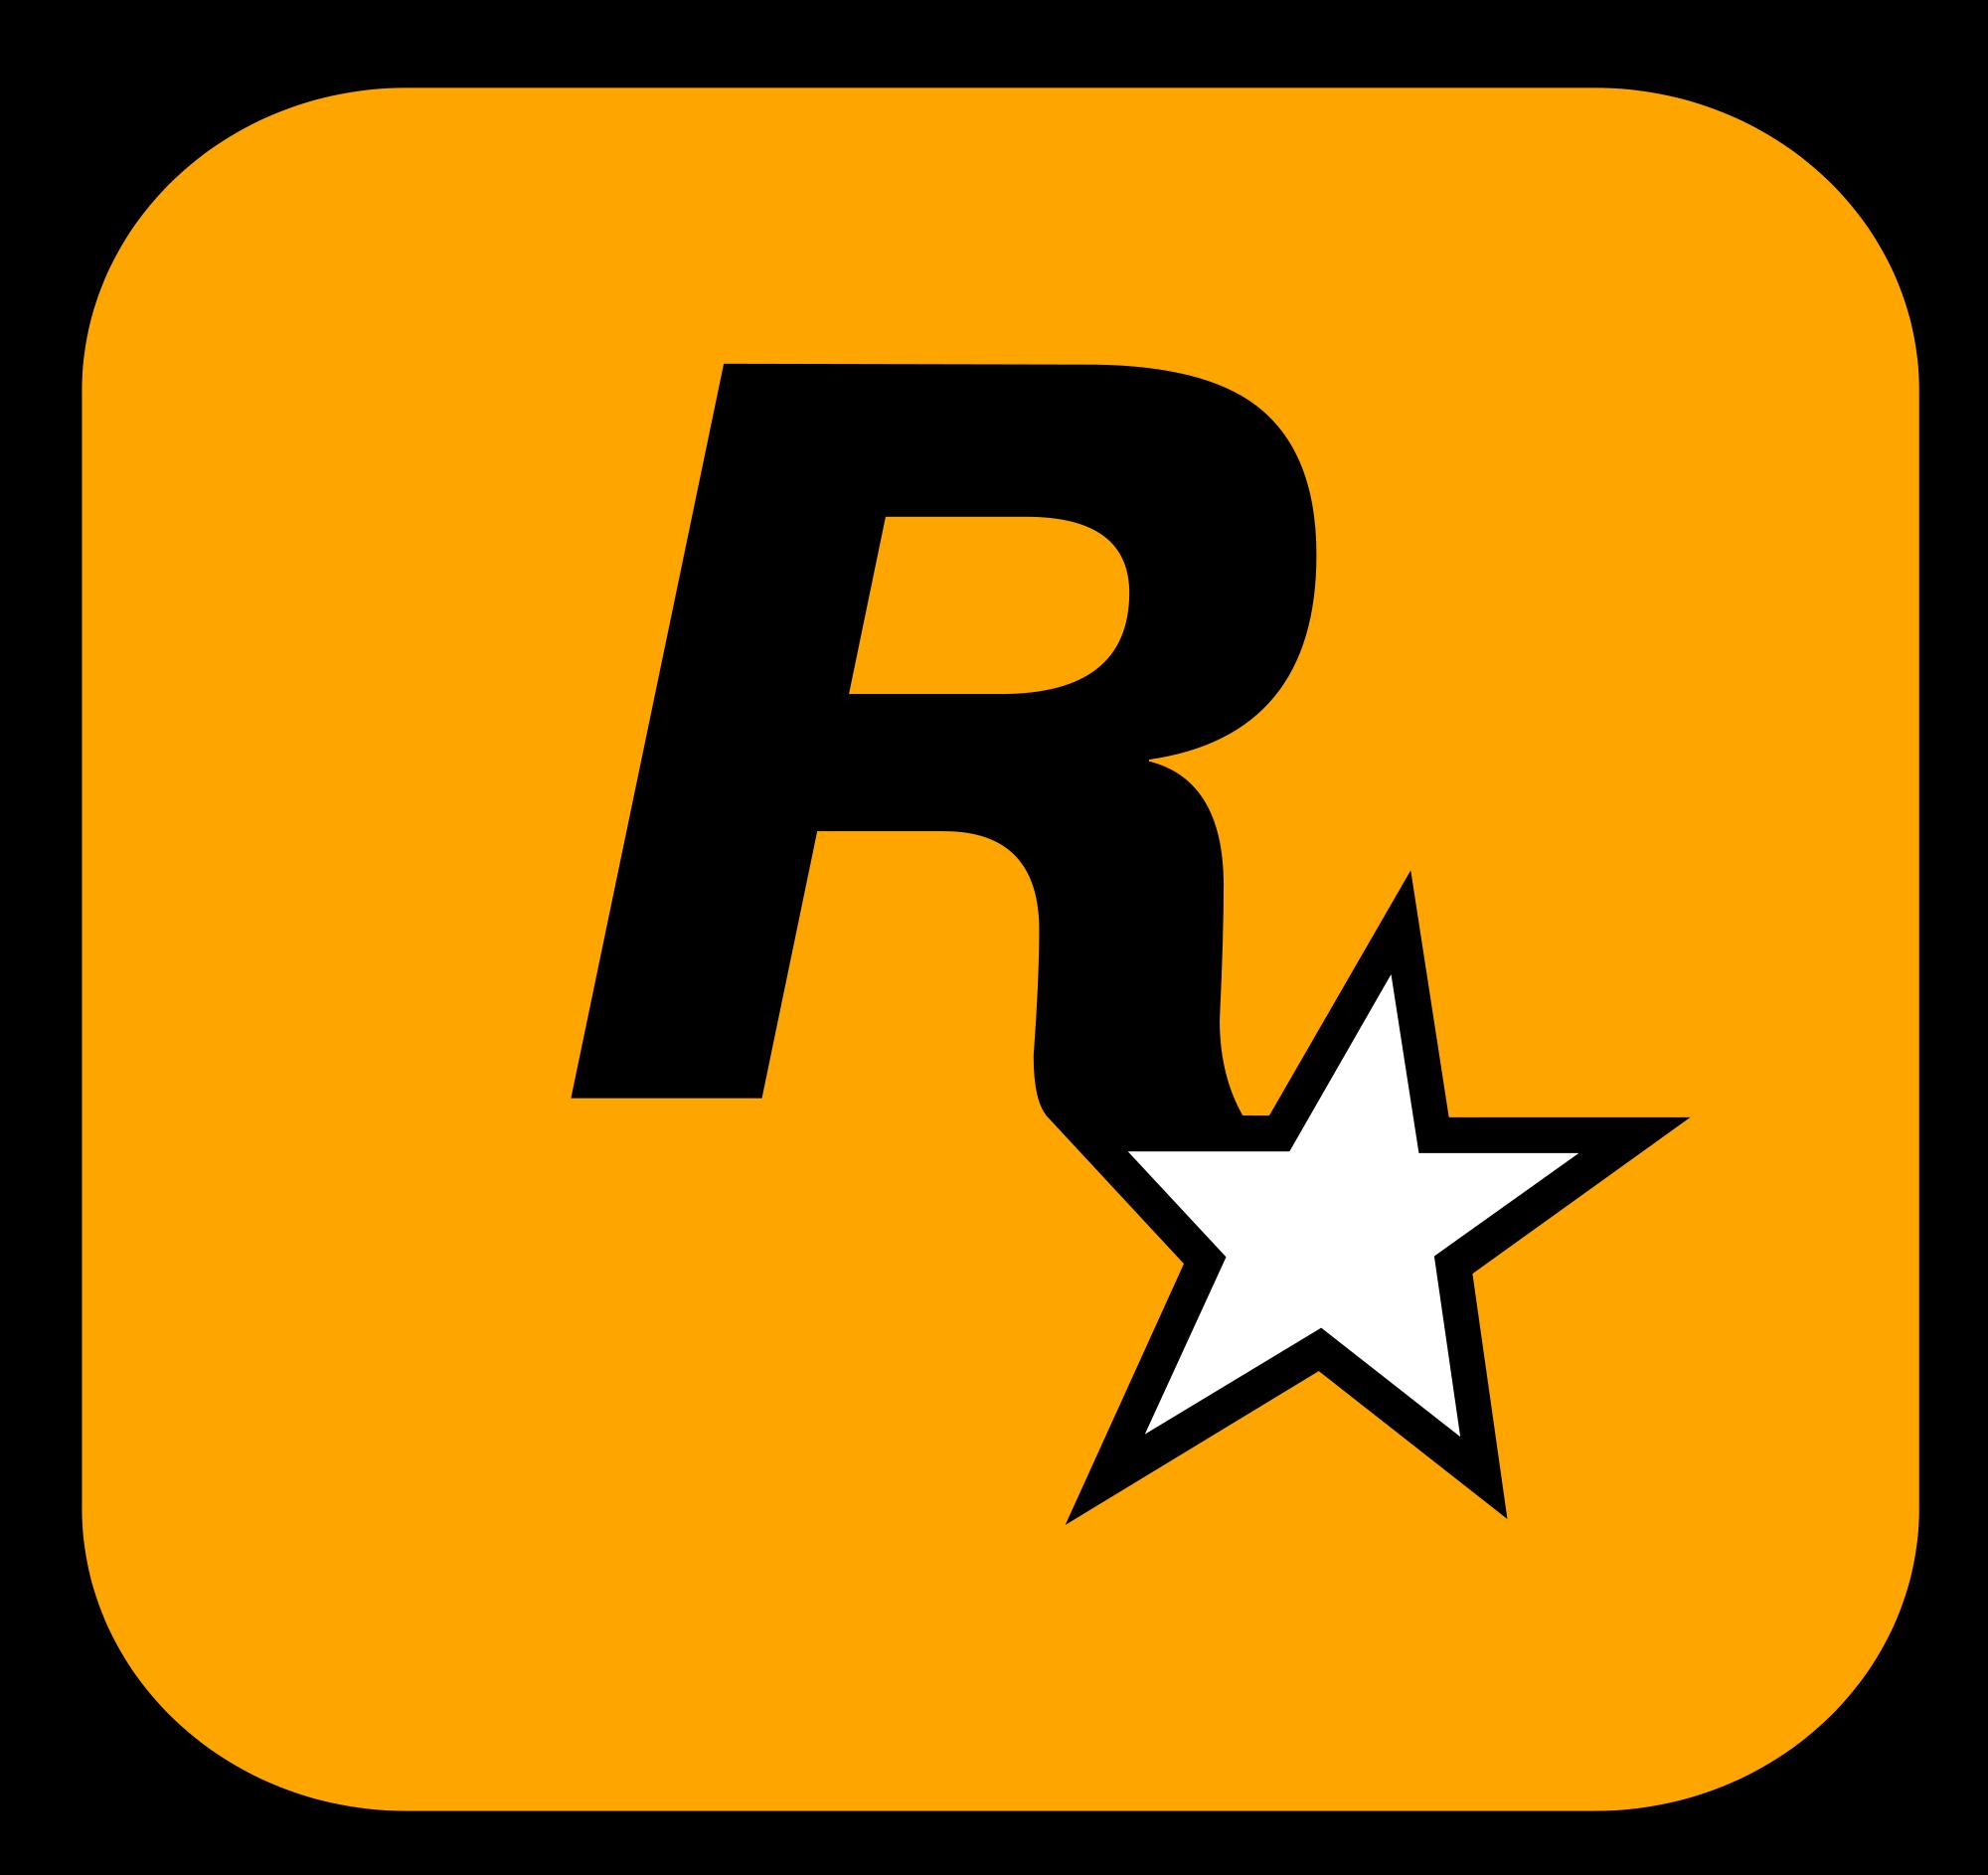 Rockstar PNG - 110455